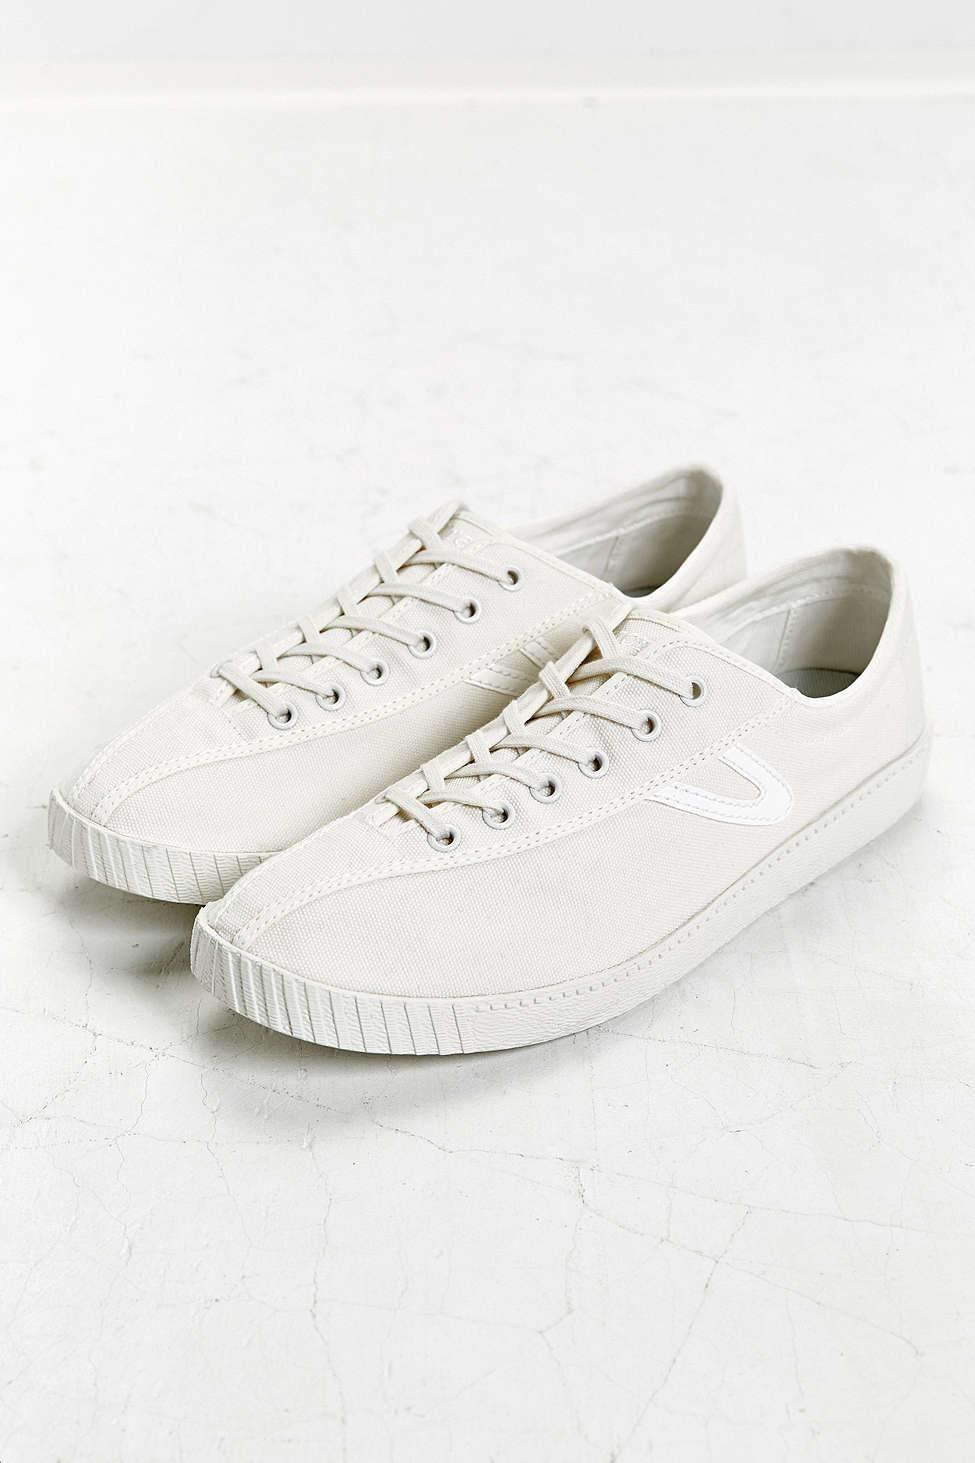 Tretorn Canvas Tennis Shoes For Women